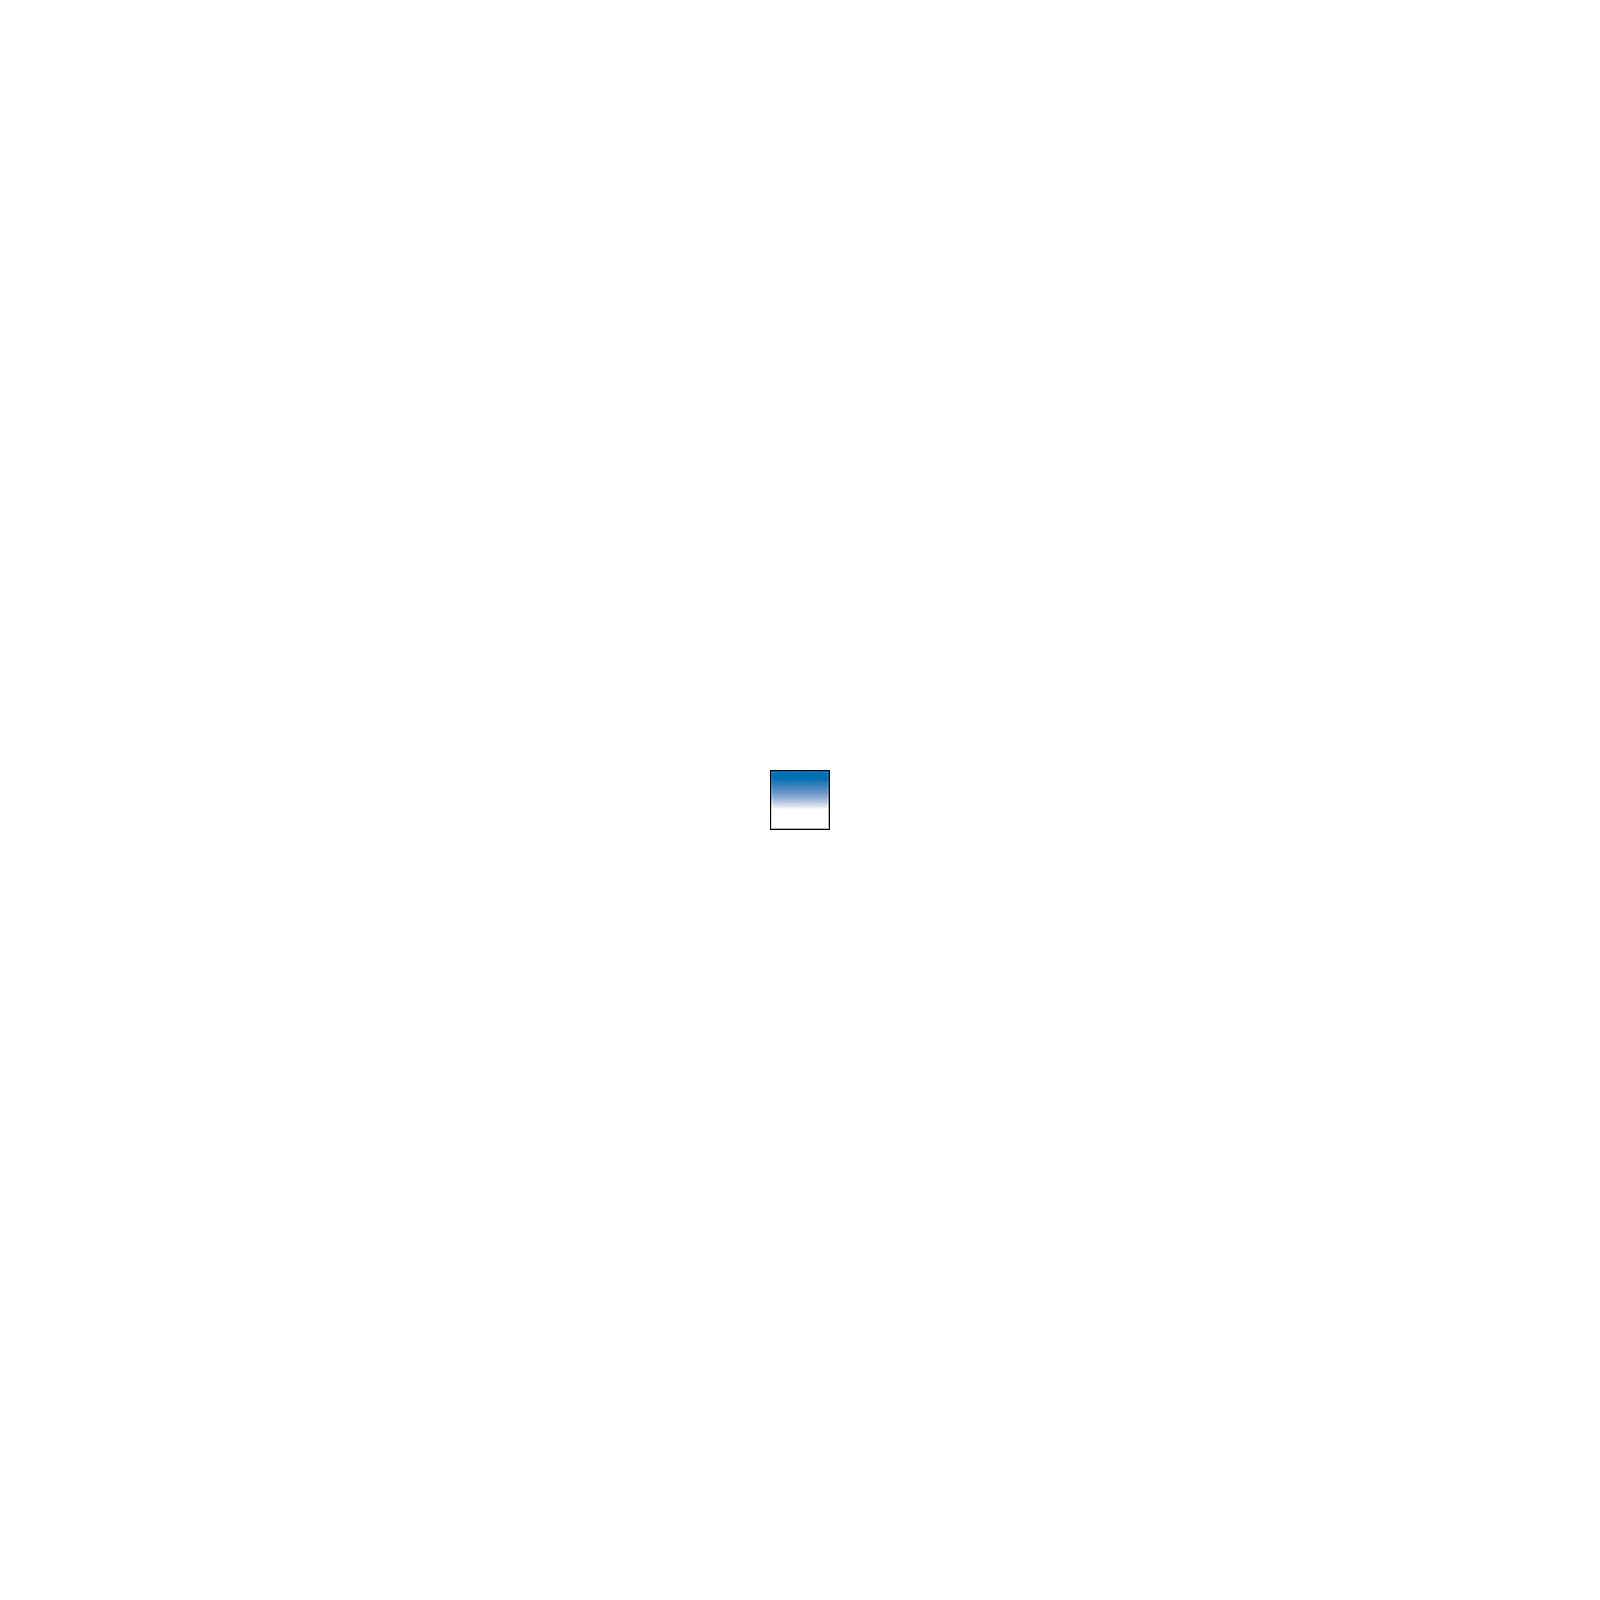 Cokin A123S Verlauf Blau 2S